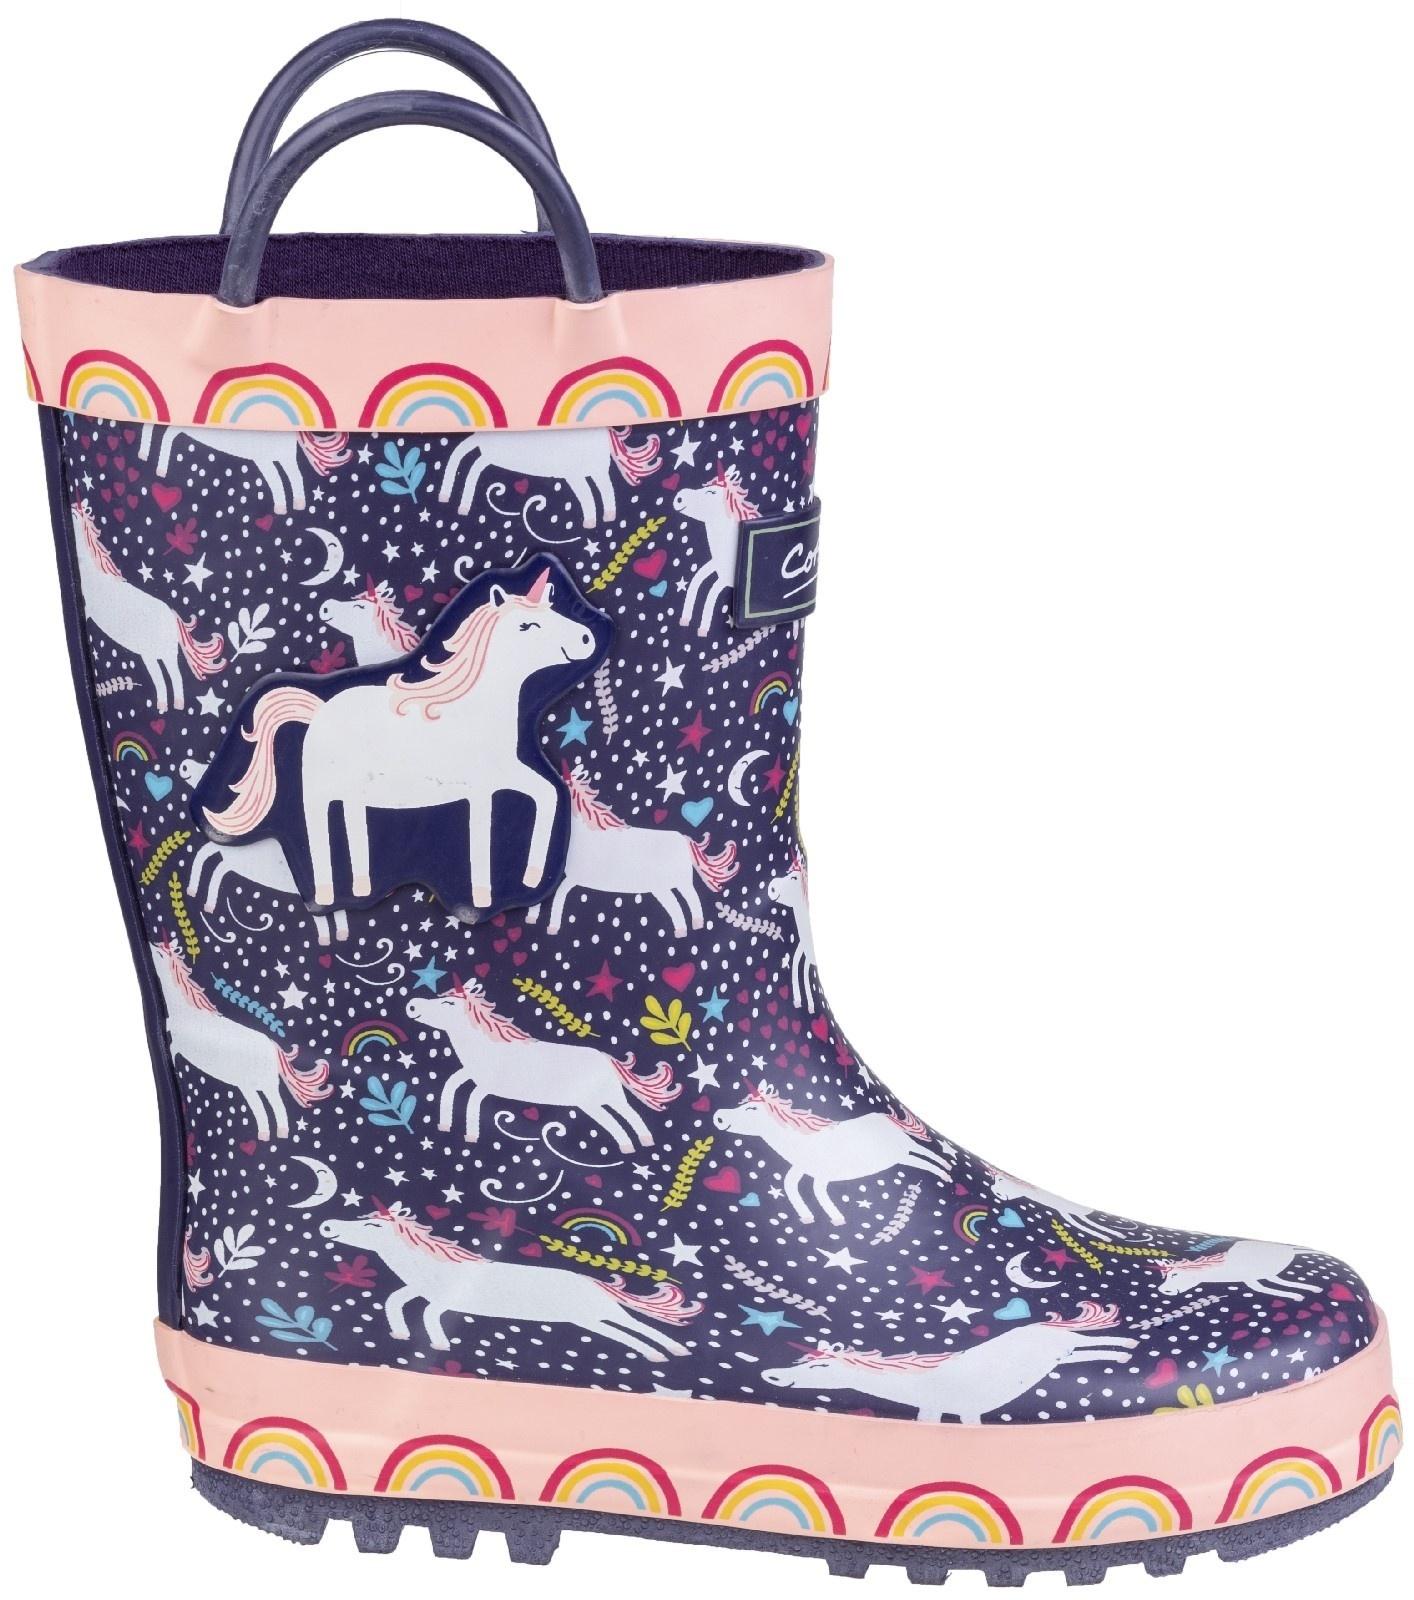 Cotswold Cotsworld Sprinkle Unicorn Wellies